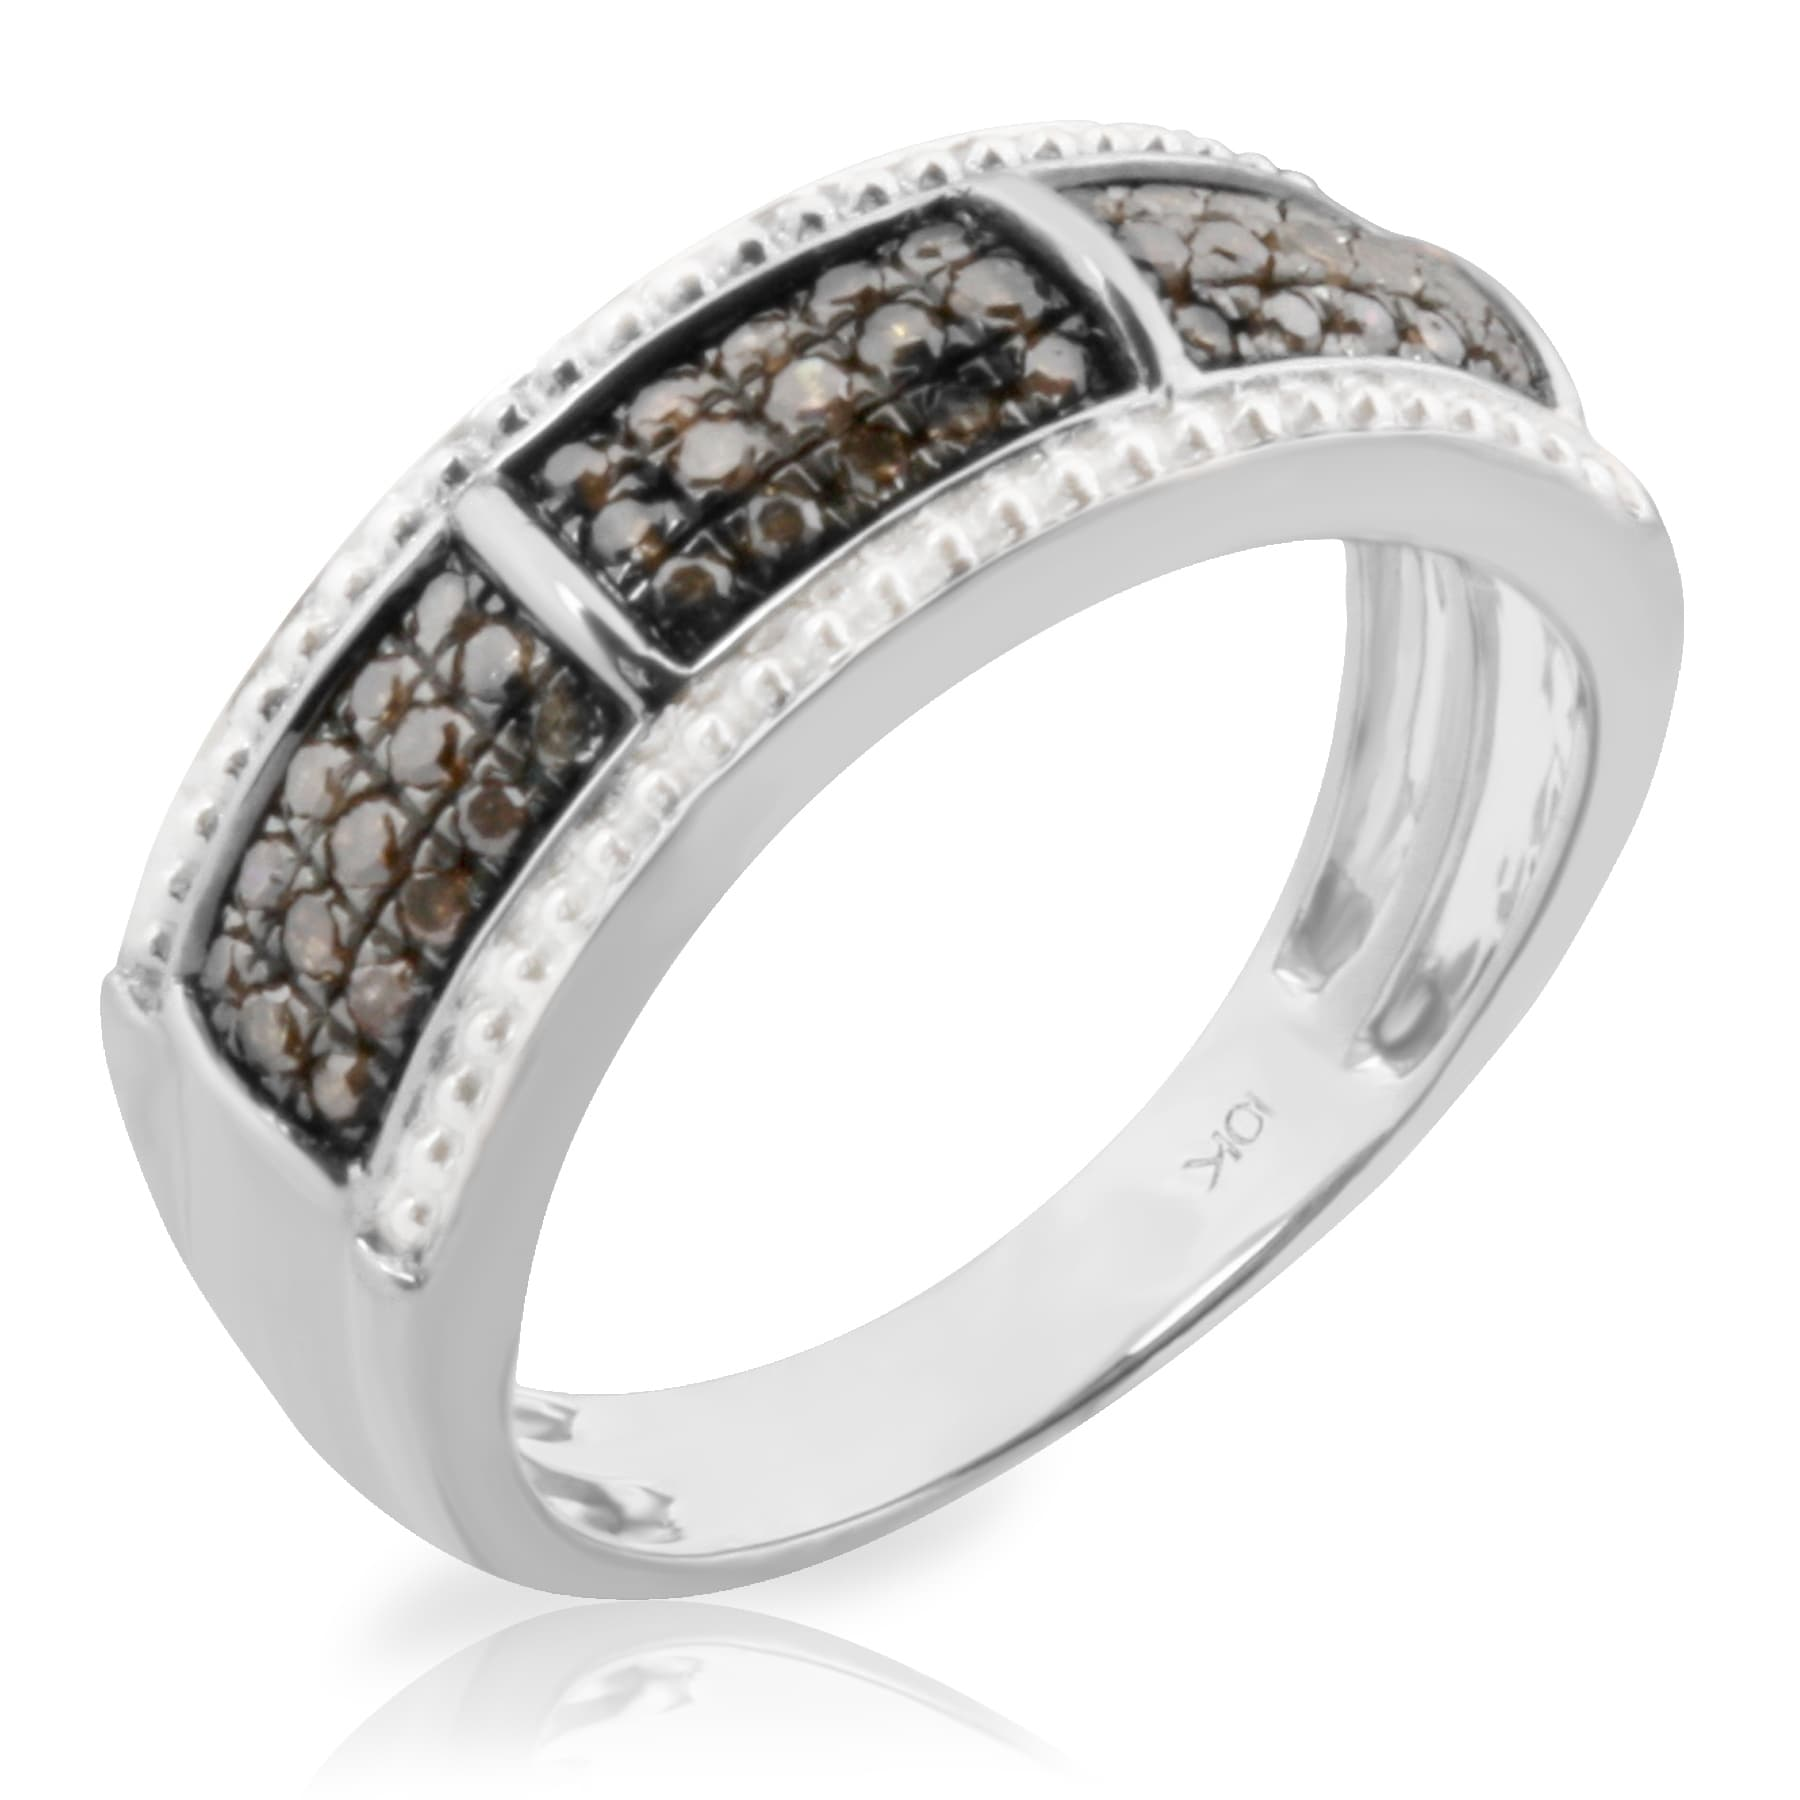 Brand New 0.37 Carat Round Brilliant Cut Real Brown Diamond Anniversary Ring - Thumbnail 5